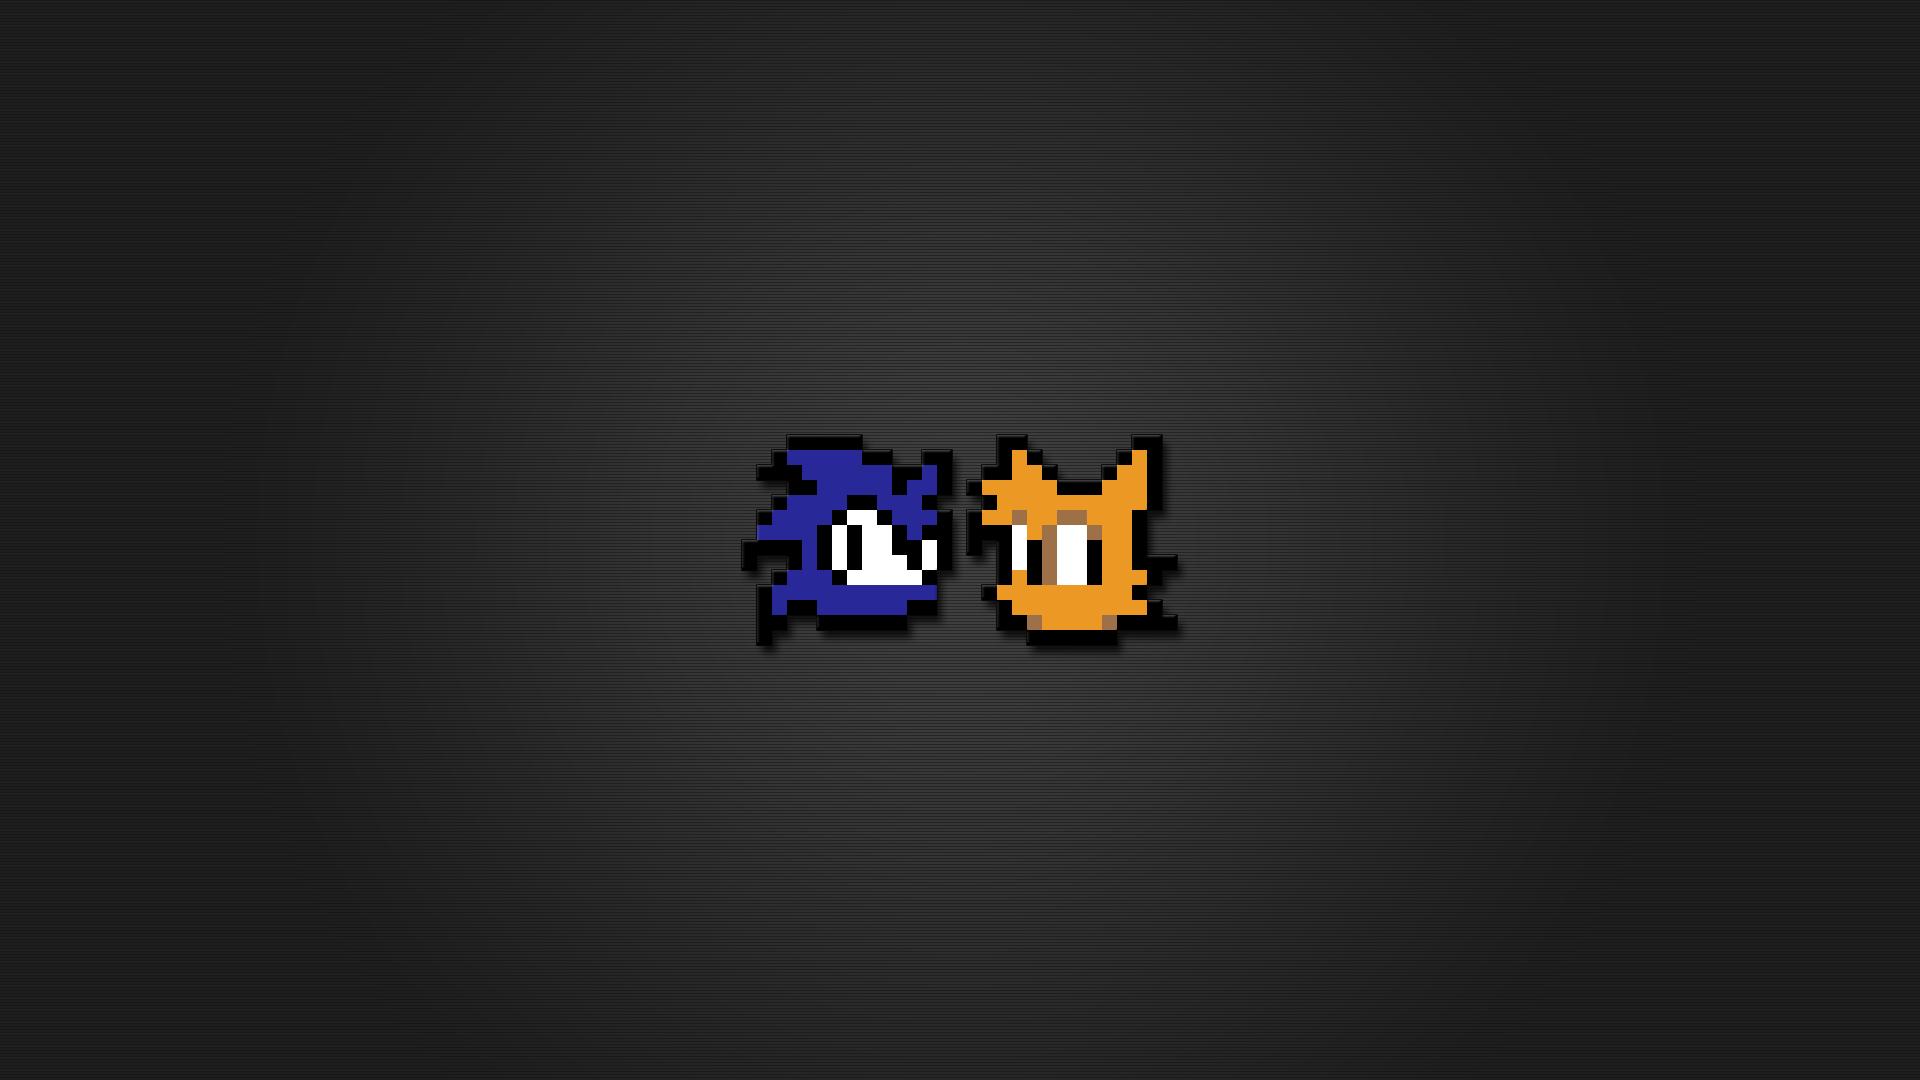 Sonic Wallpaper - QyGjxZ